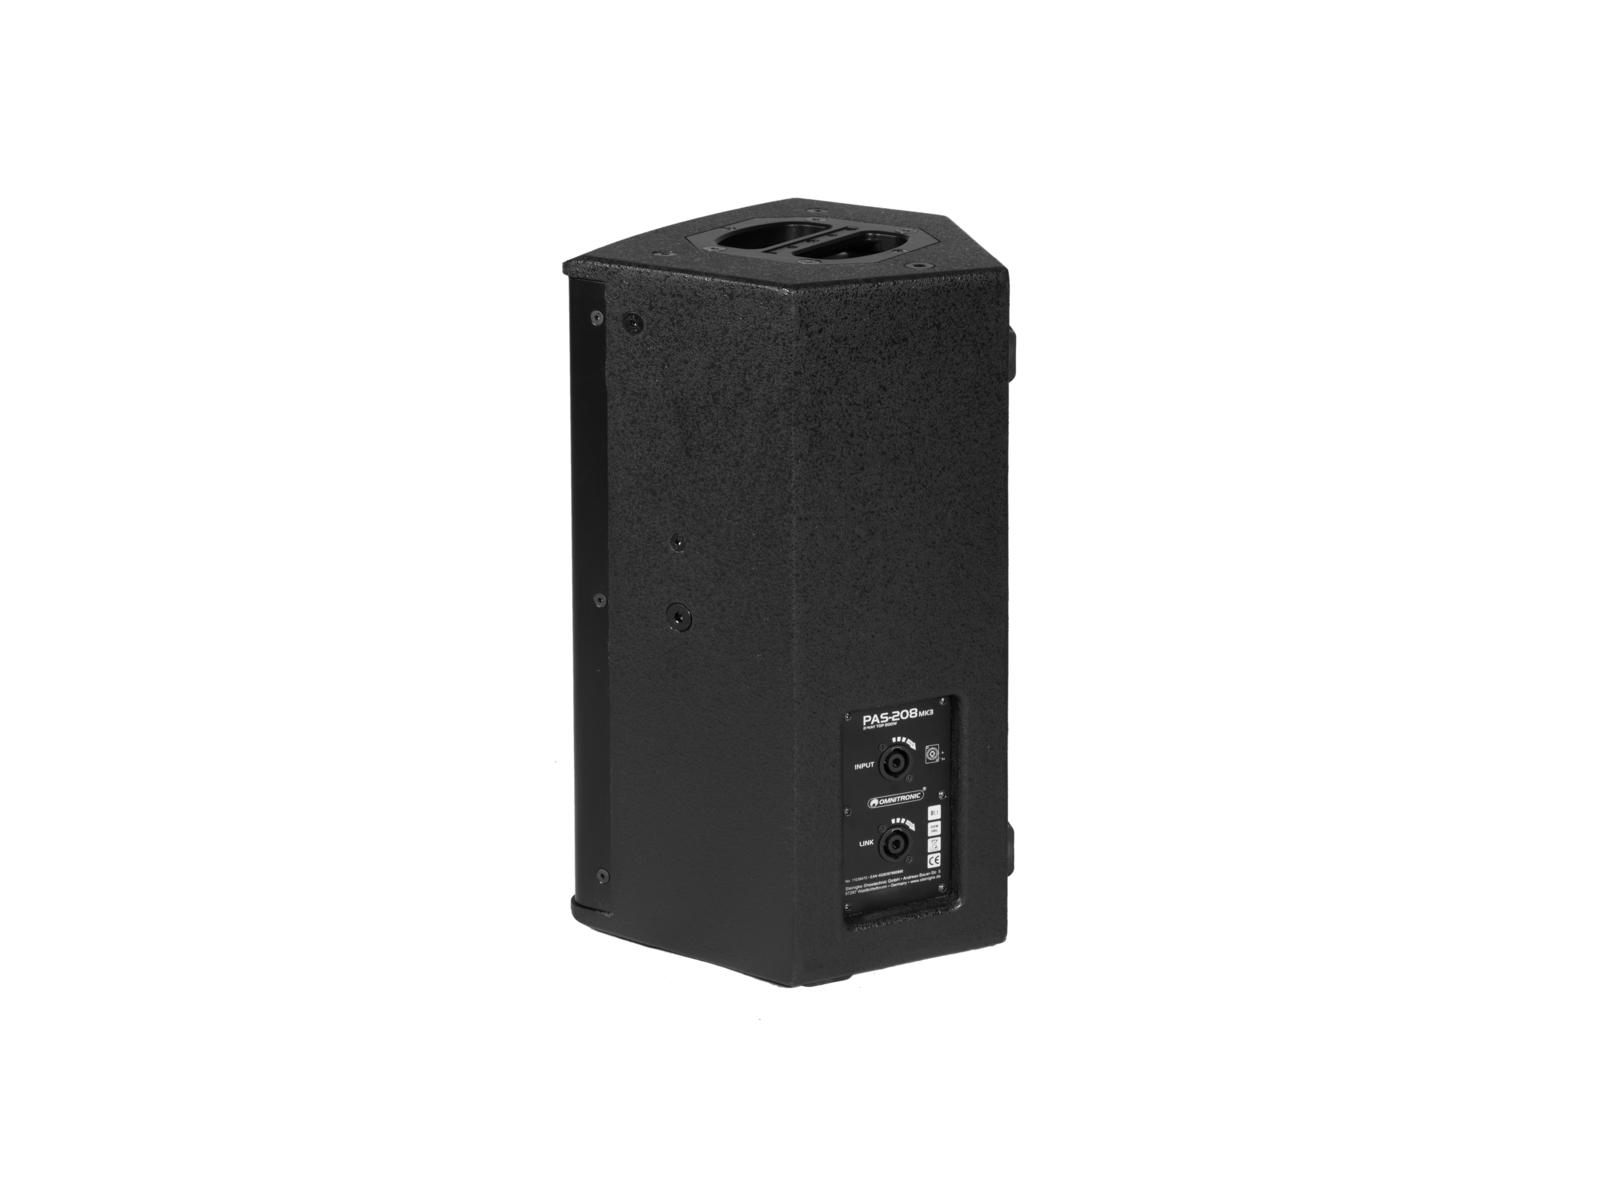 OMNITRONIC PAS-208 MK3 2-Wege-Top